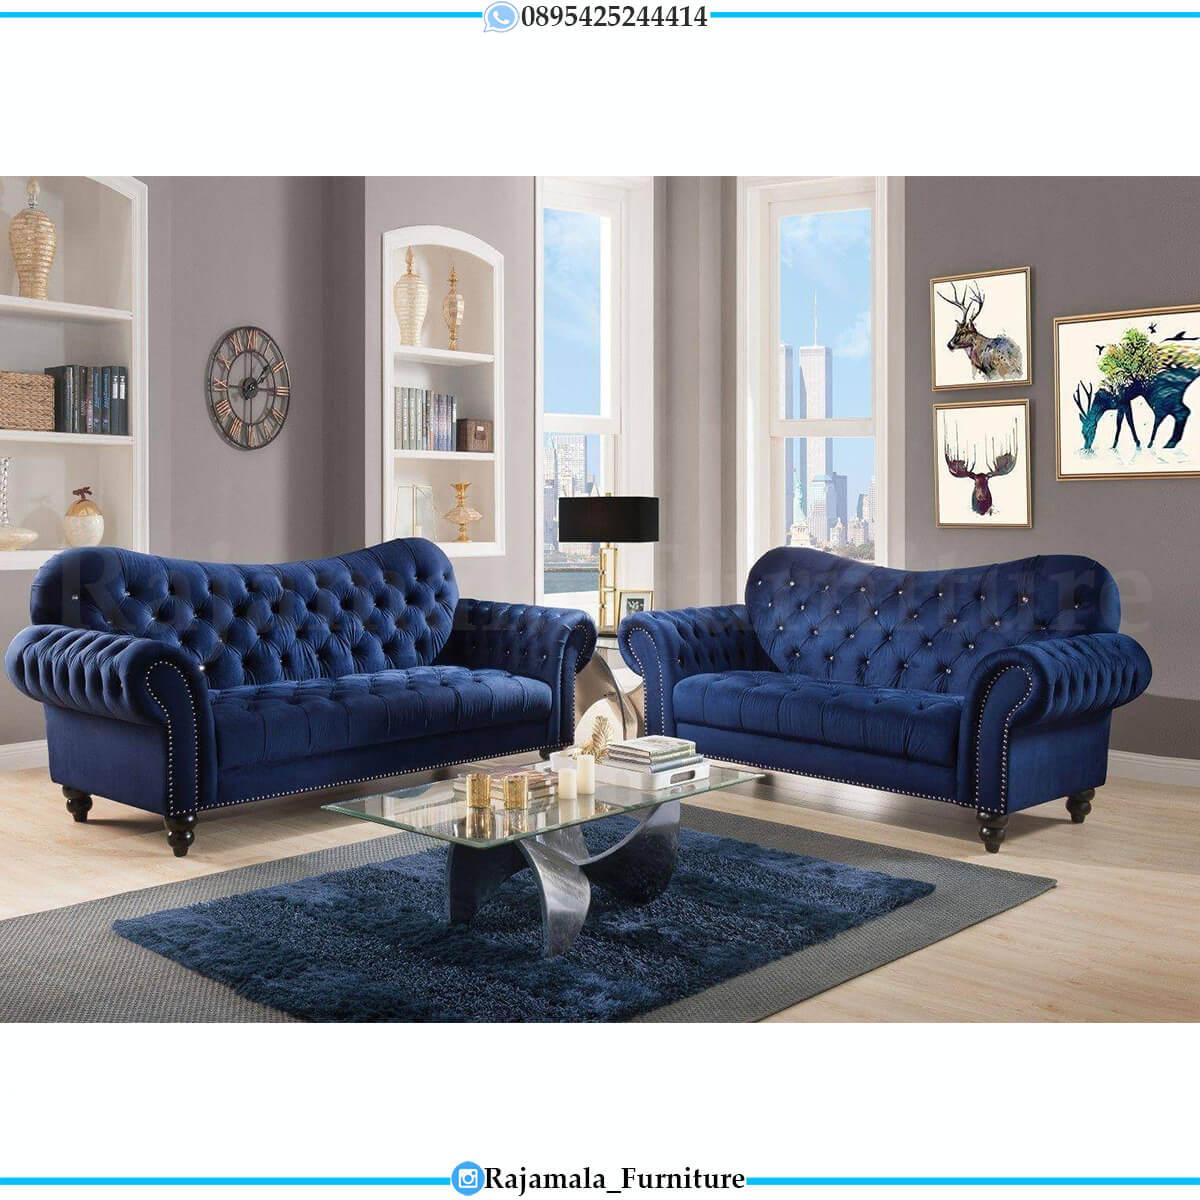 Sofa Tamu Minimalis Terbaru Chester Style Luxury Soft Beludru Fabric RM-0612